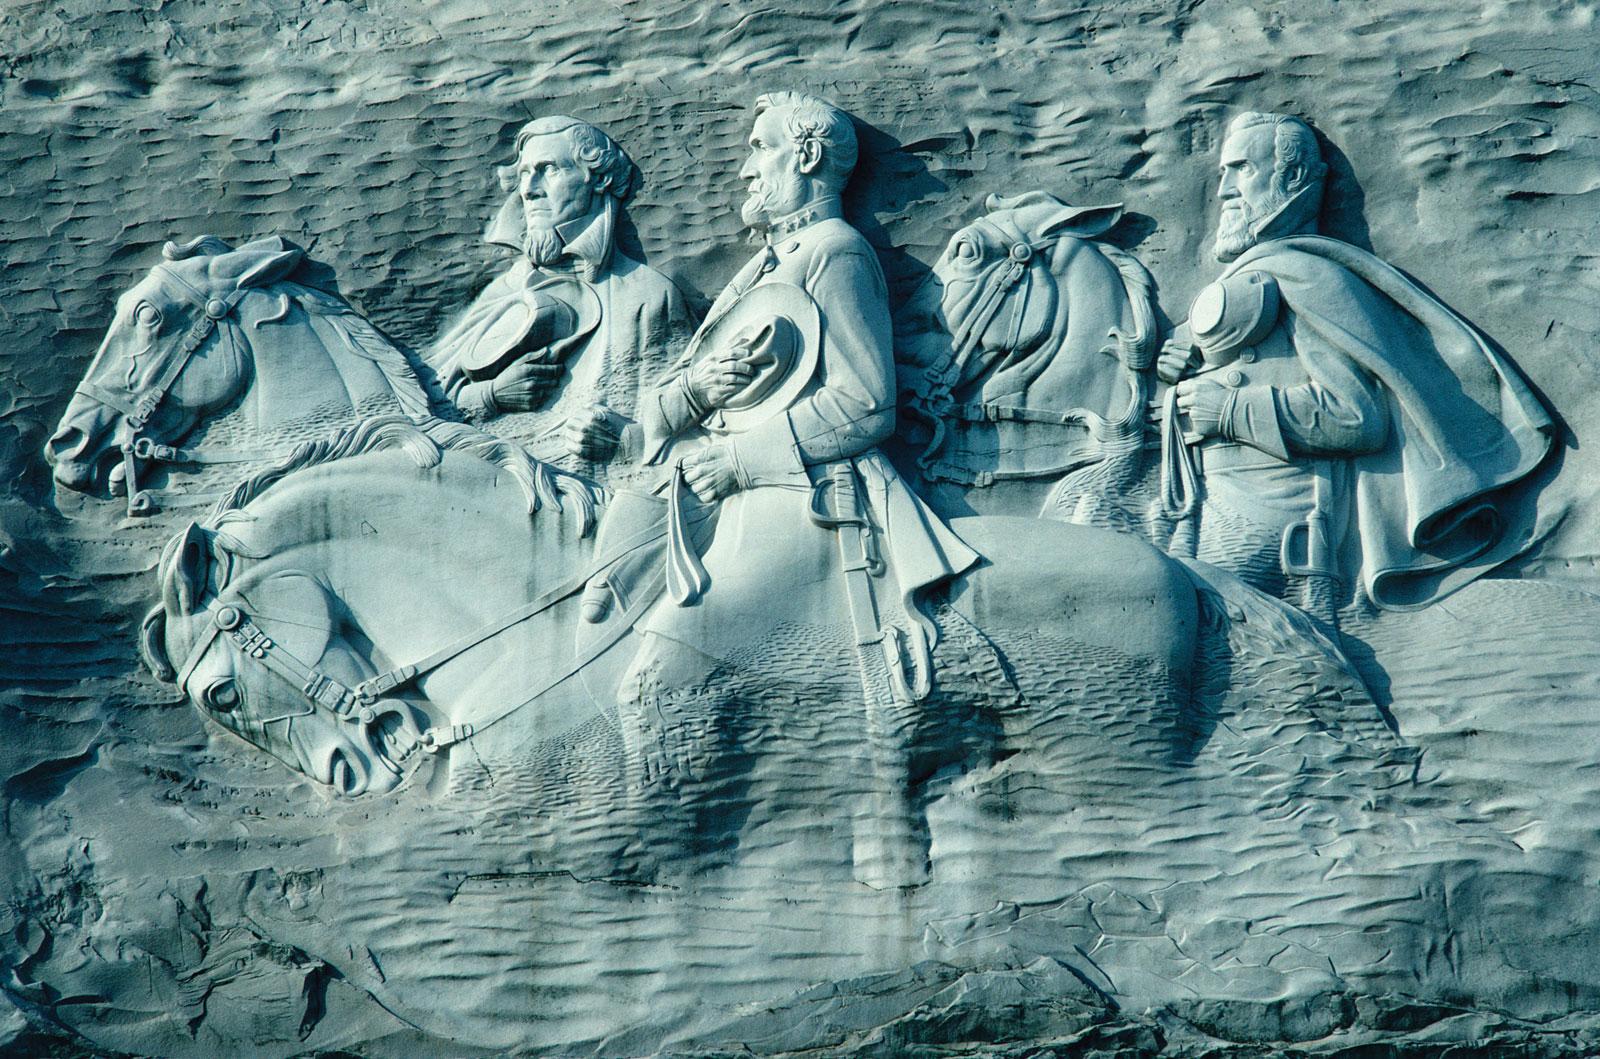 carving-leaders-Confederate-Robert-E-Lee-Jefferson